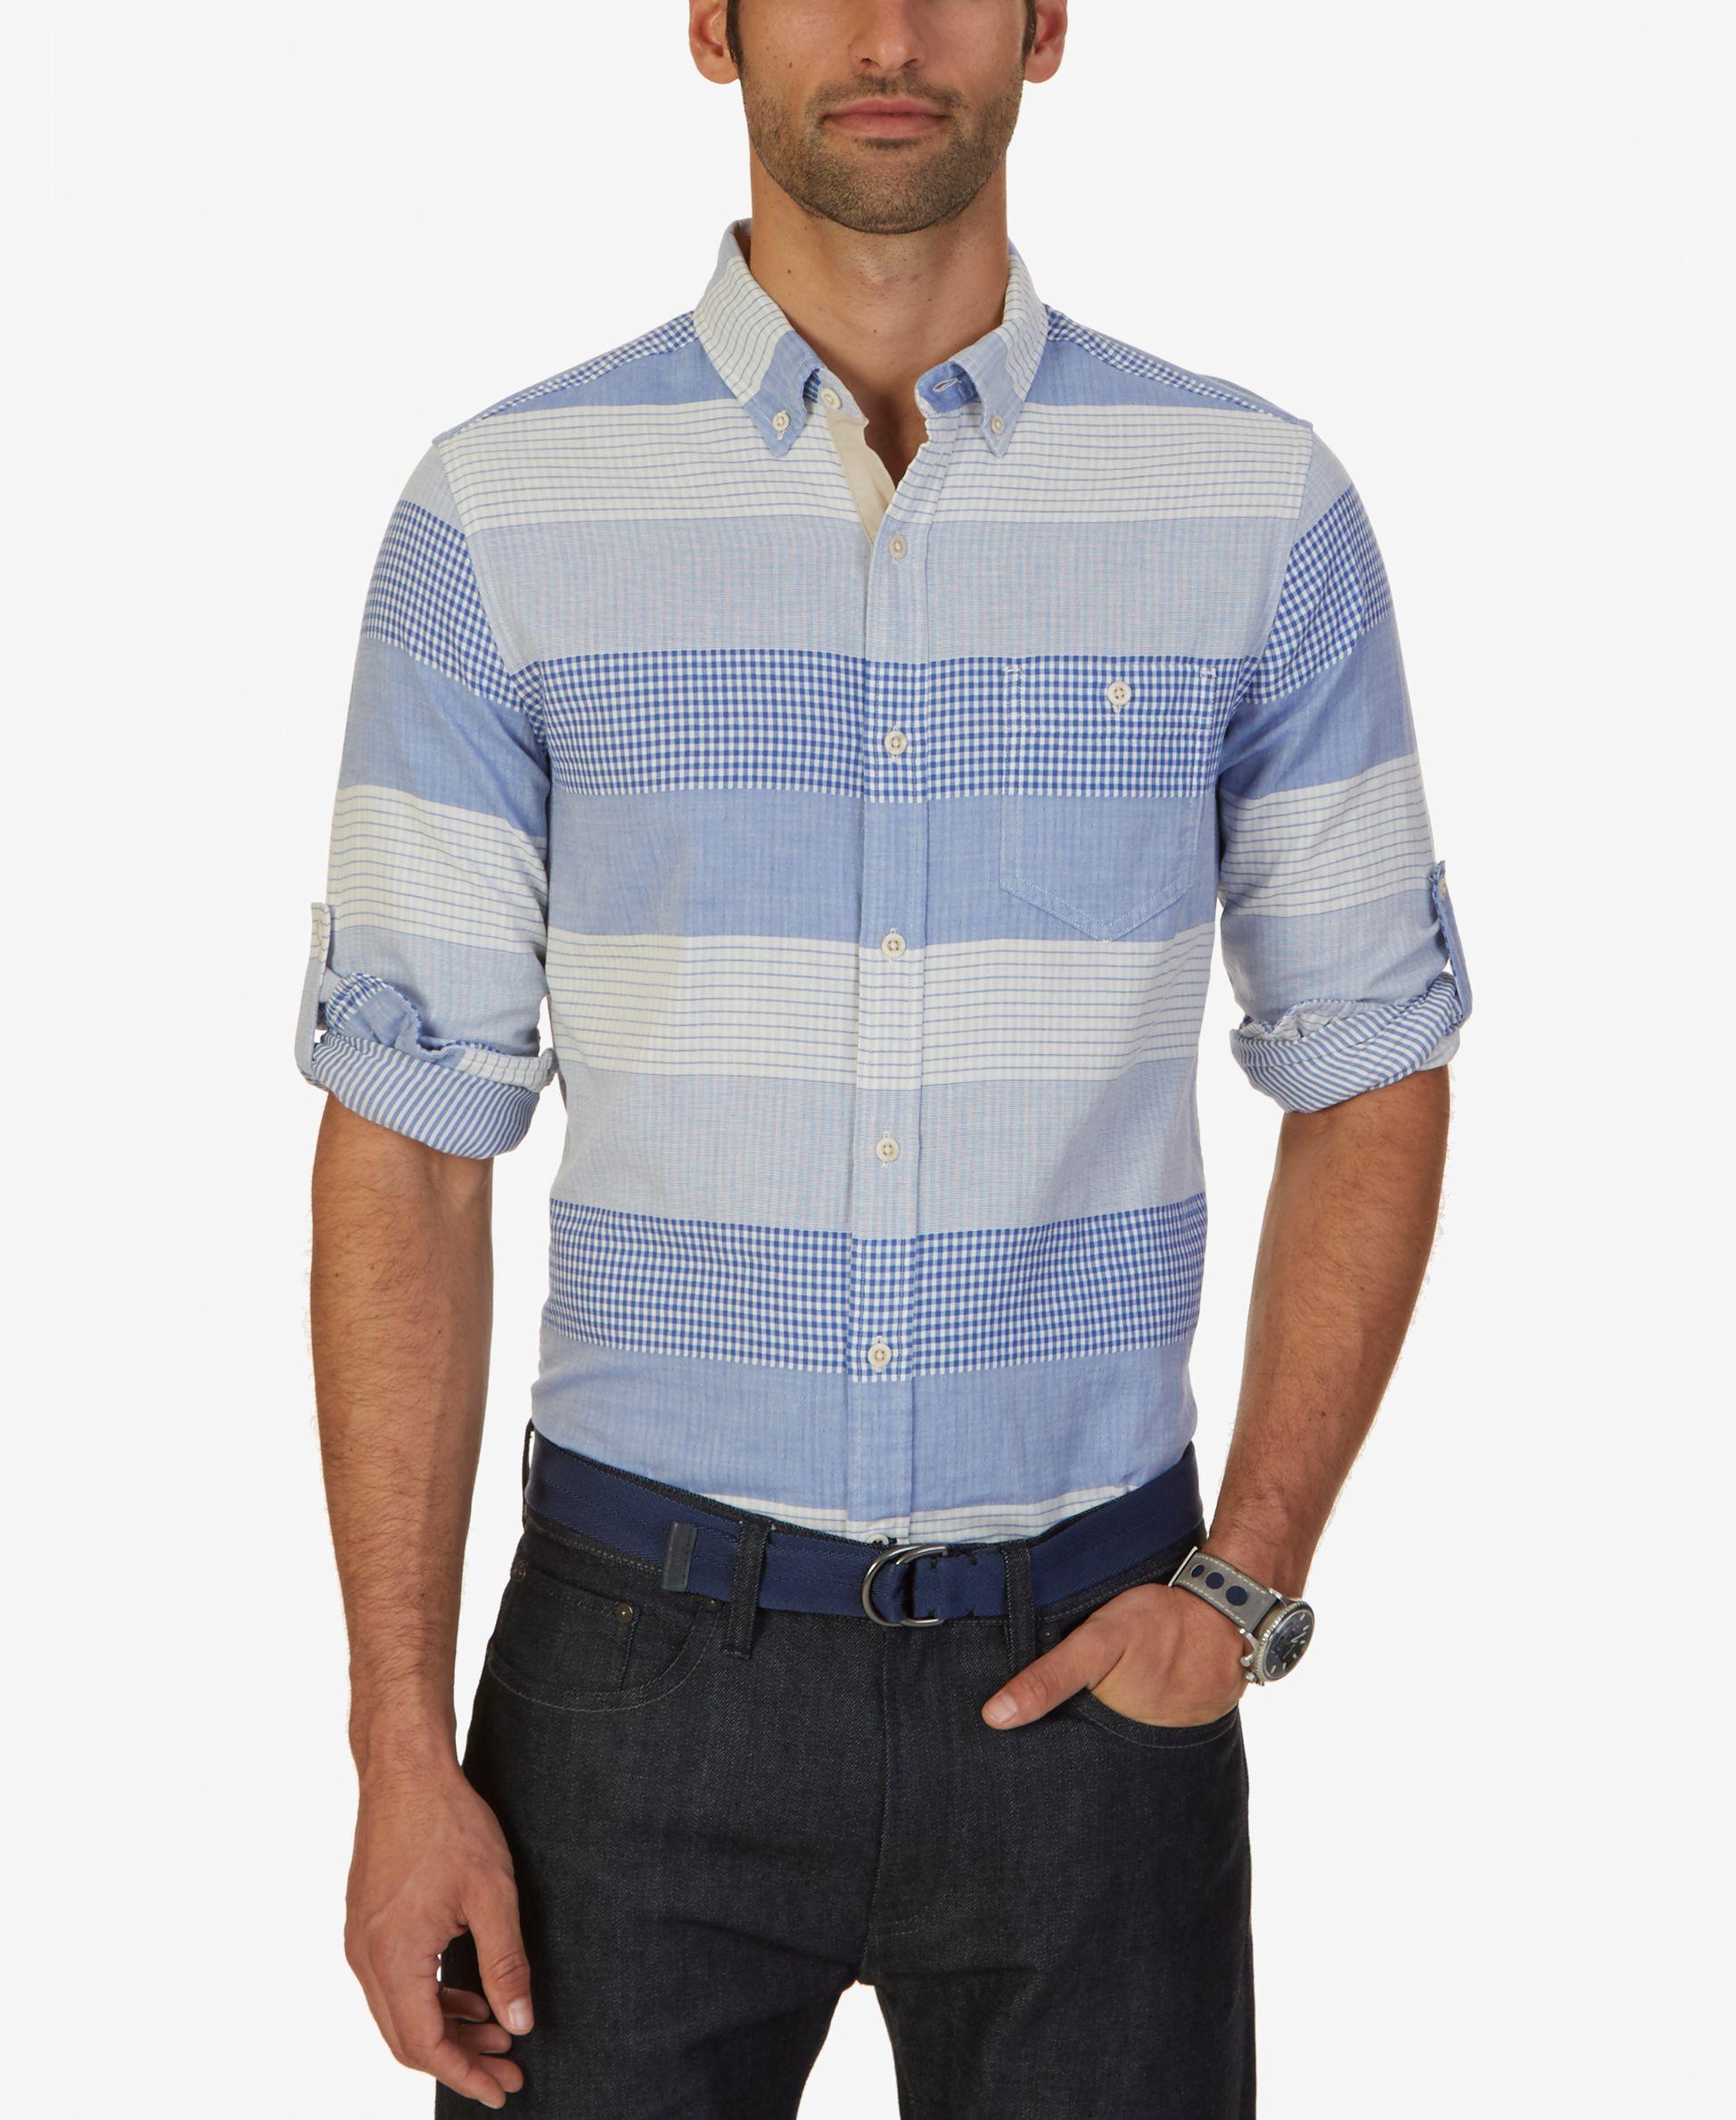 Flannel shirt with khaki pants  Nautica Menus Plaid Stripe Shirt  Menswear  Pinterest